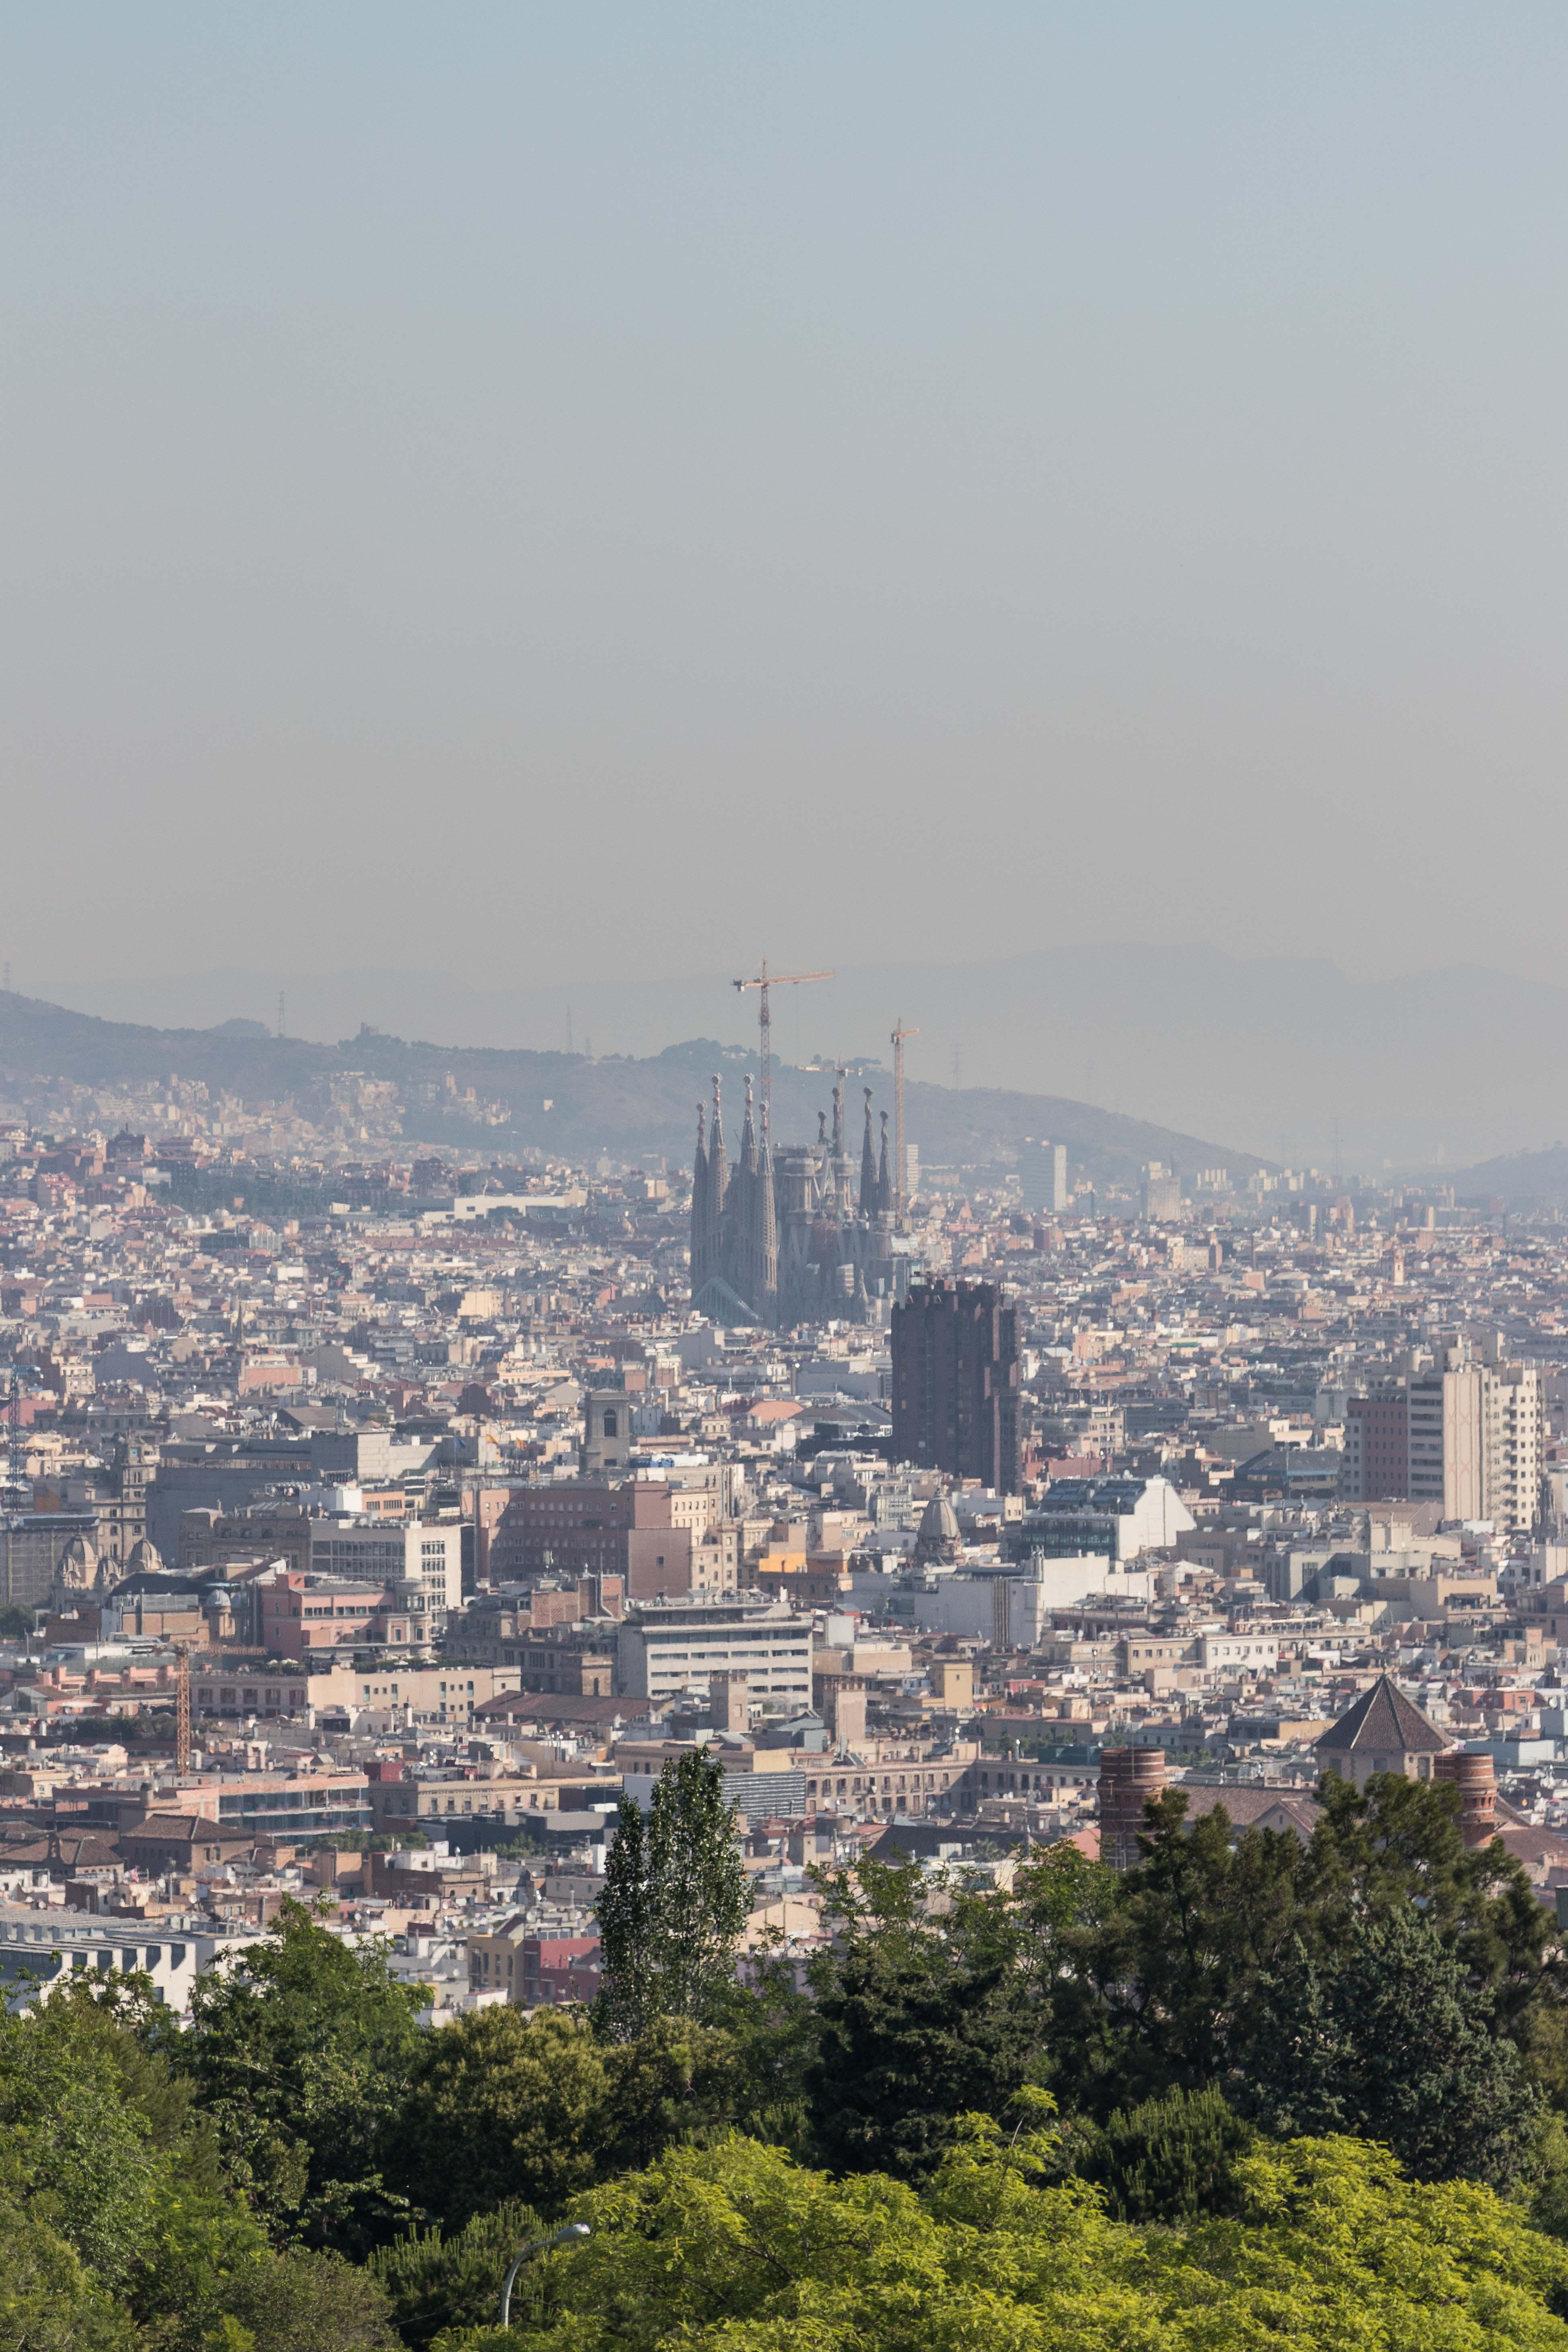 Barcelona Skyline in the Morning | https://www.roseclearfield.com